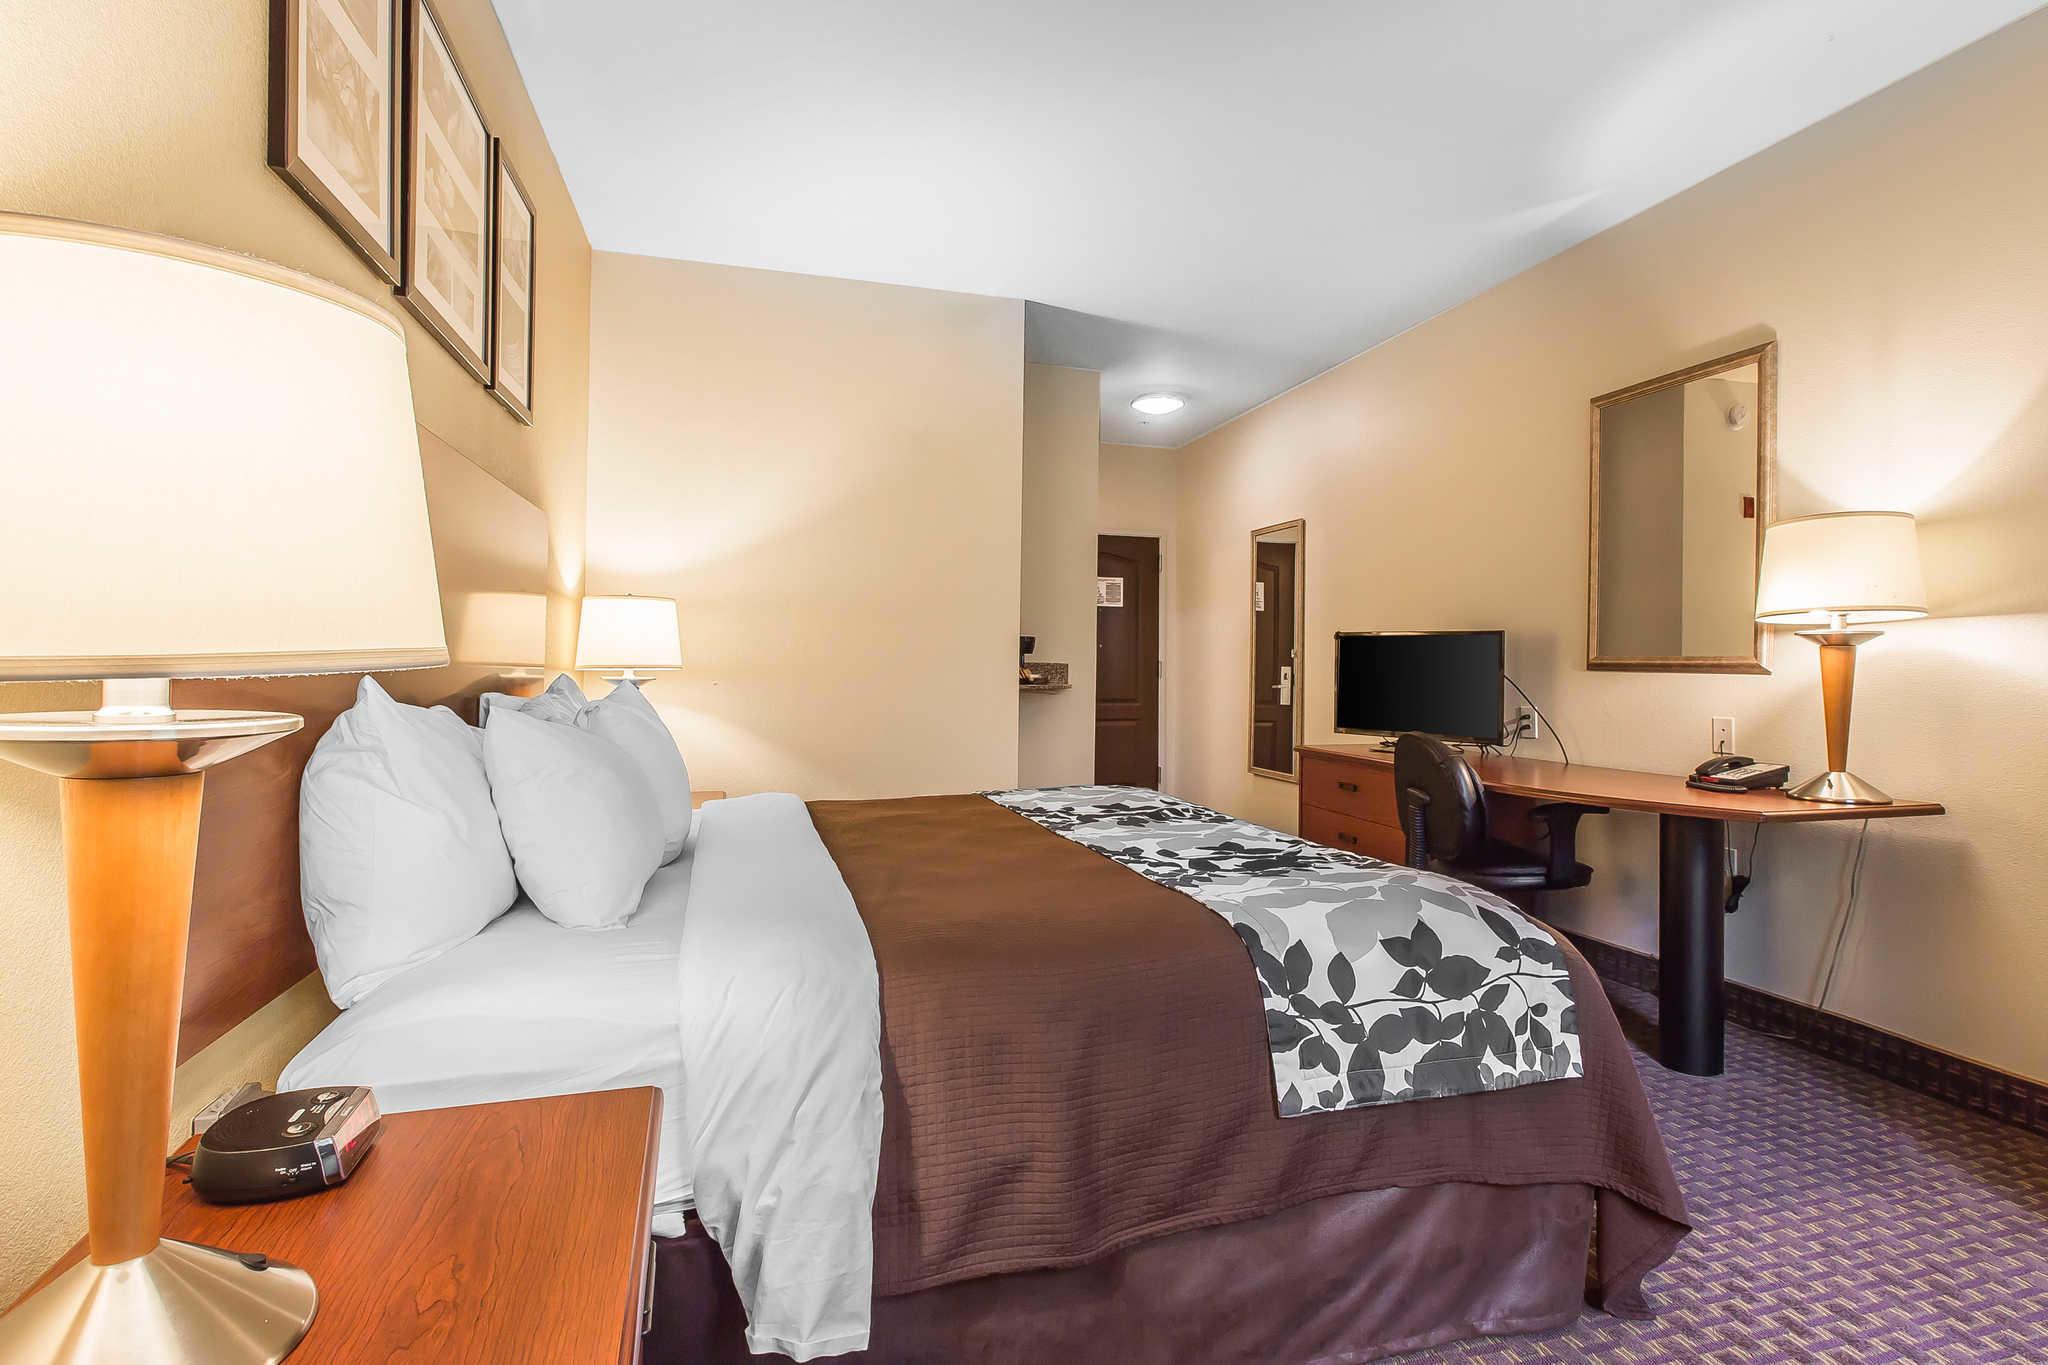 Sleep Inn & Suites At Kennesaw State University image 15